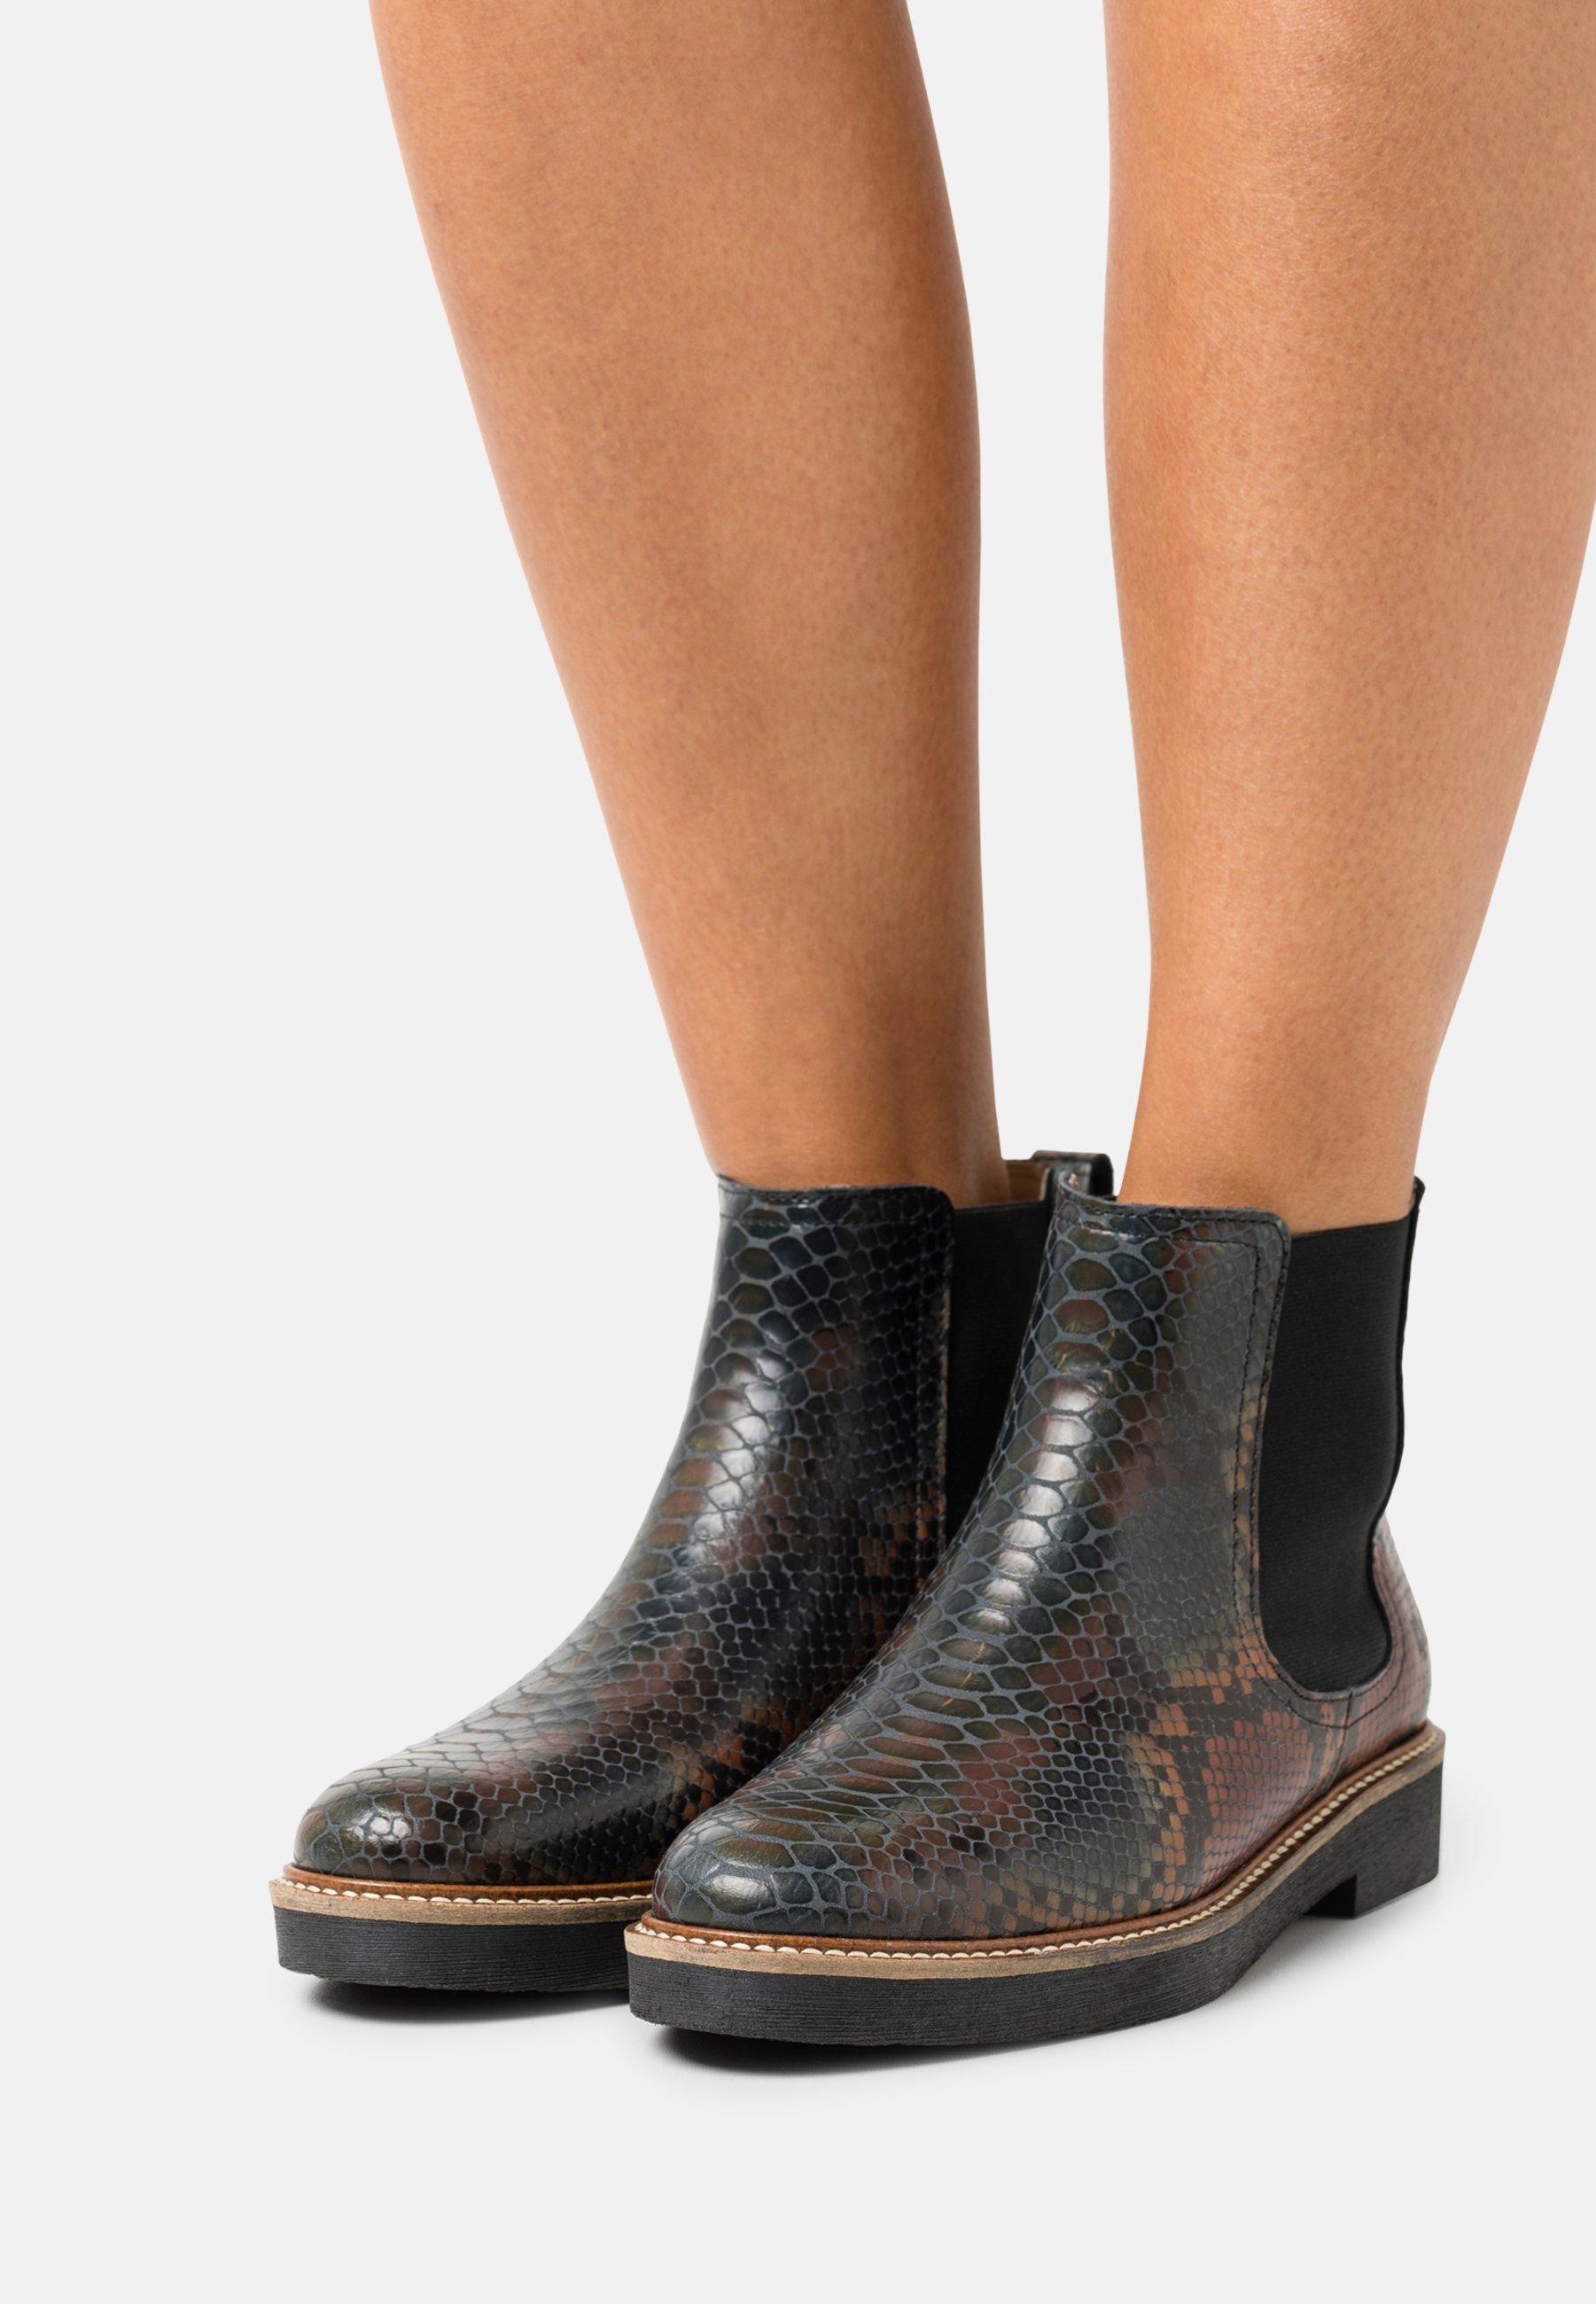 Women OXFORDCHIC - Ankle boots - multicolor